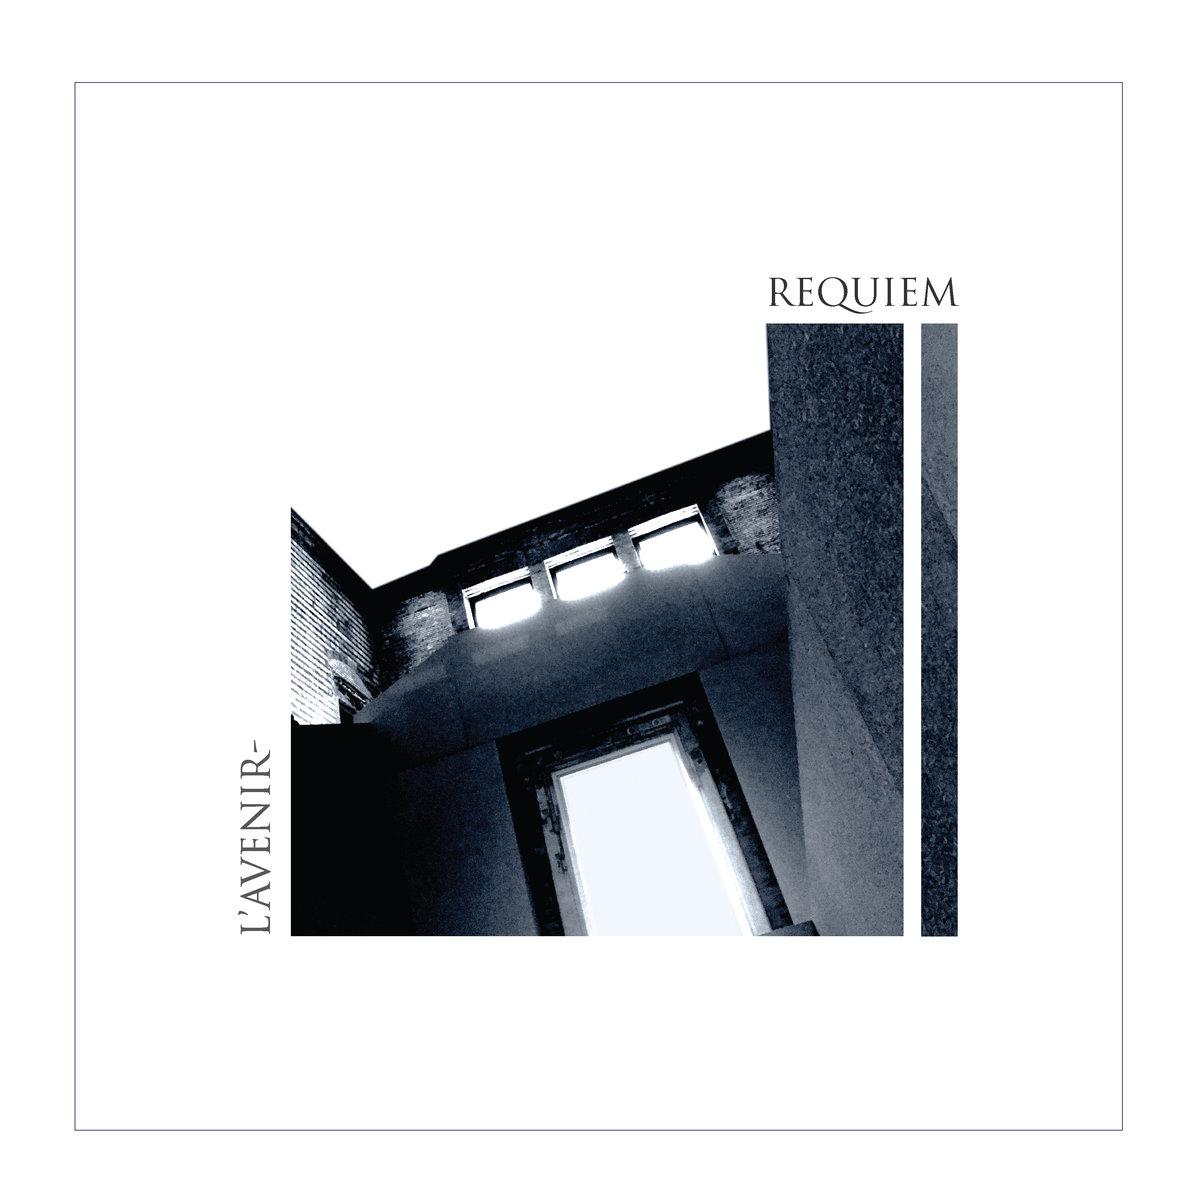 L'Avenir - Requiem (LP; 2019)